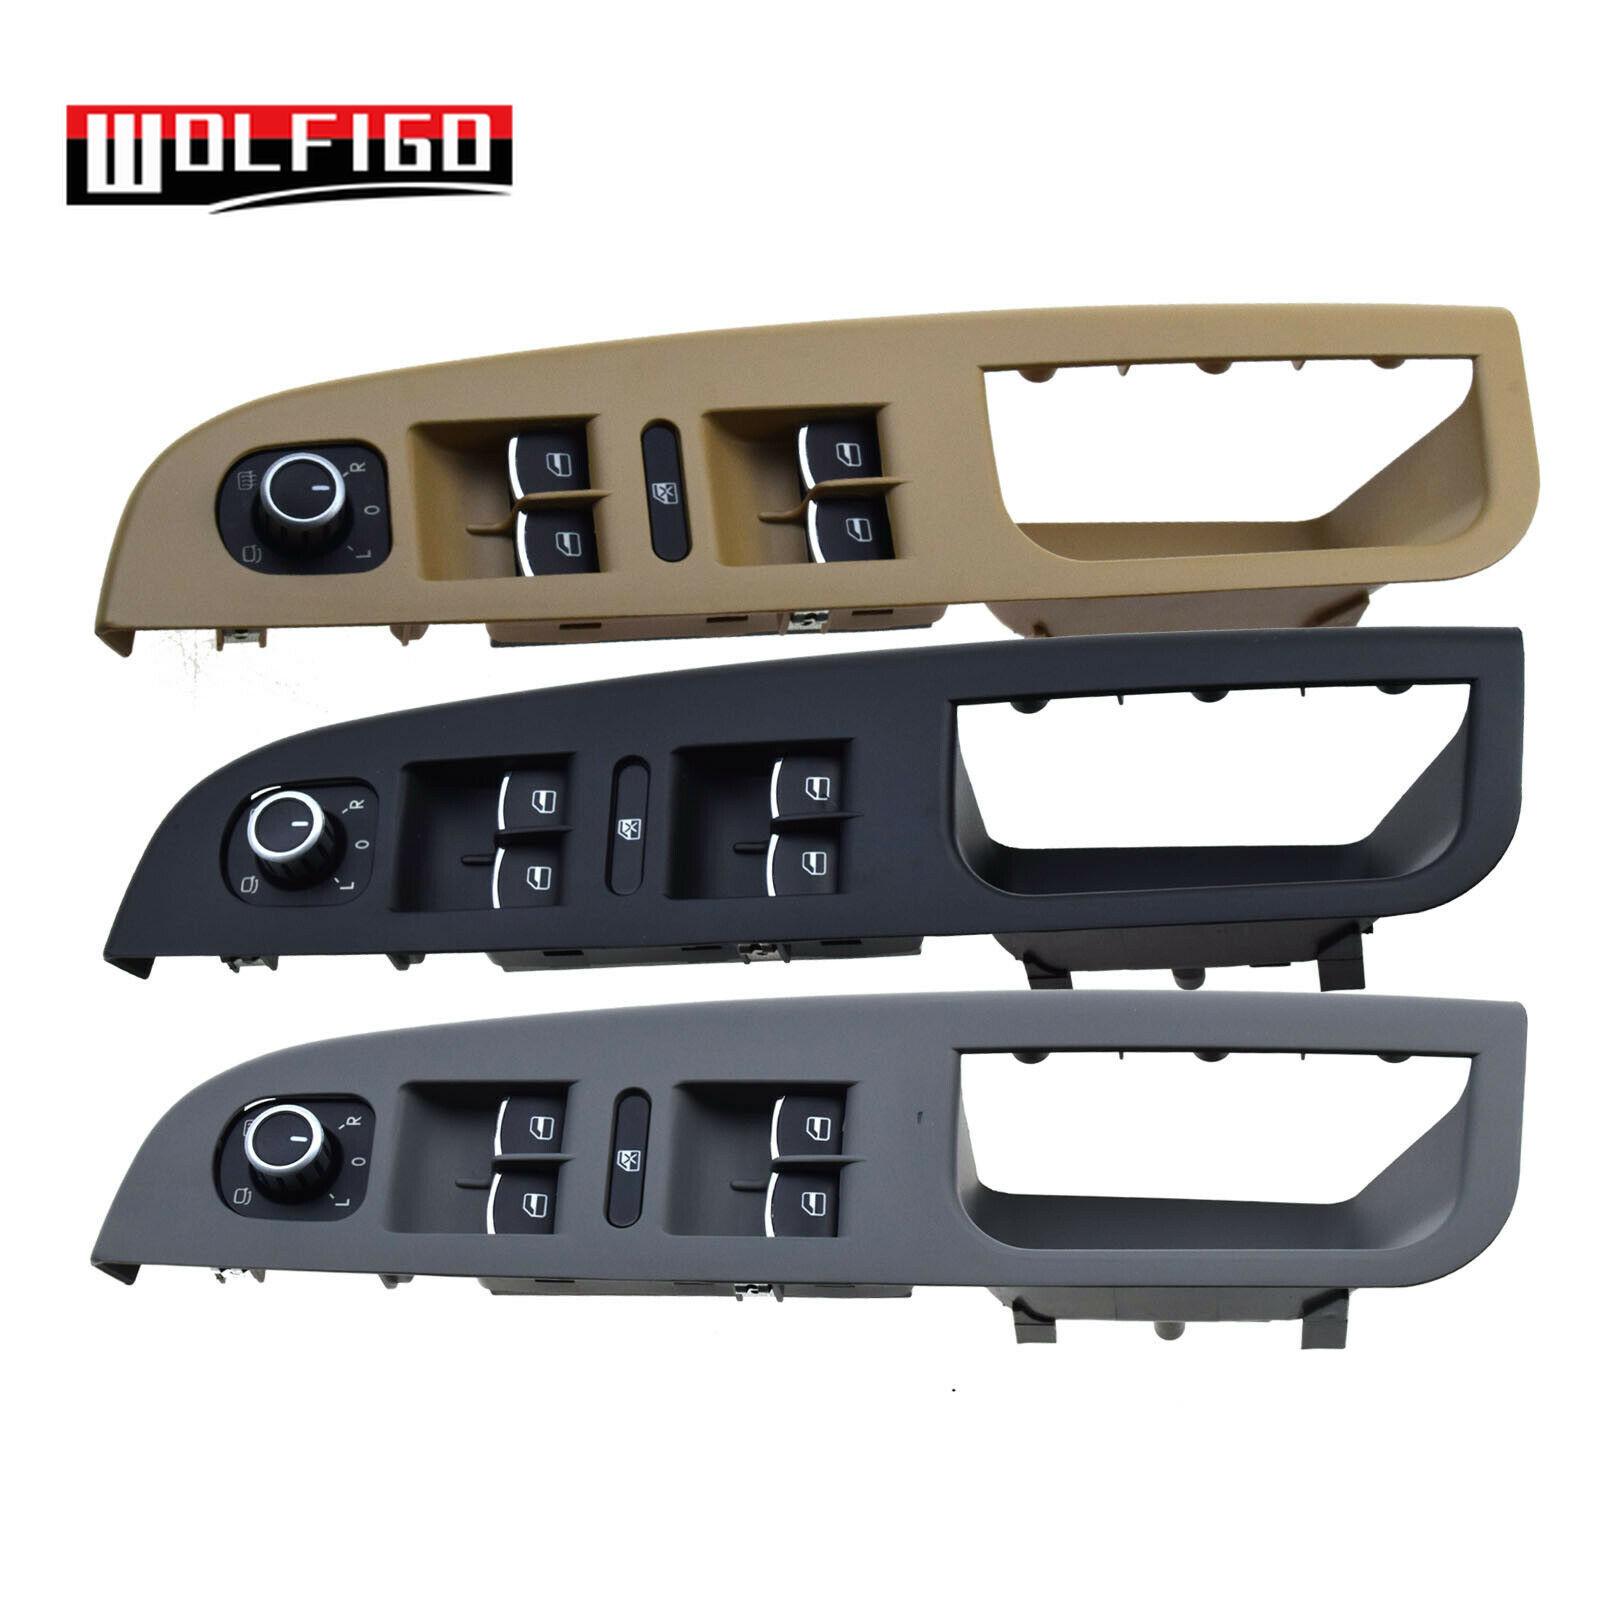 WOLFIGO Black/Beige/Grey 3PCS For VW For J-etta GOLF MK5 Master Window Switch Buttons+Bezel Panel Trim Kit 1K4868049C,5ND959565A